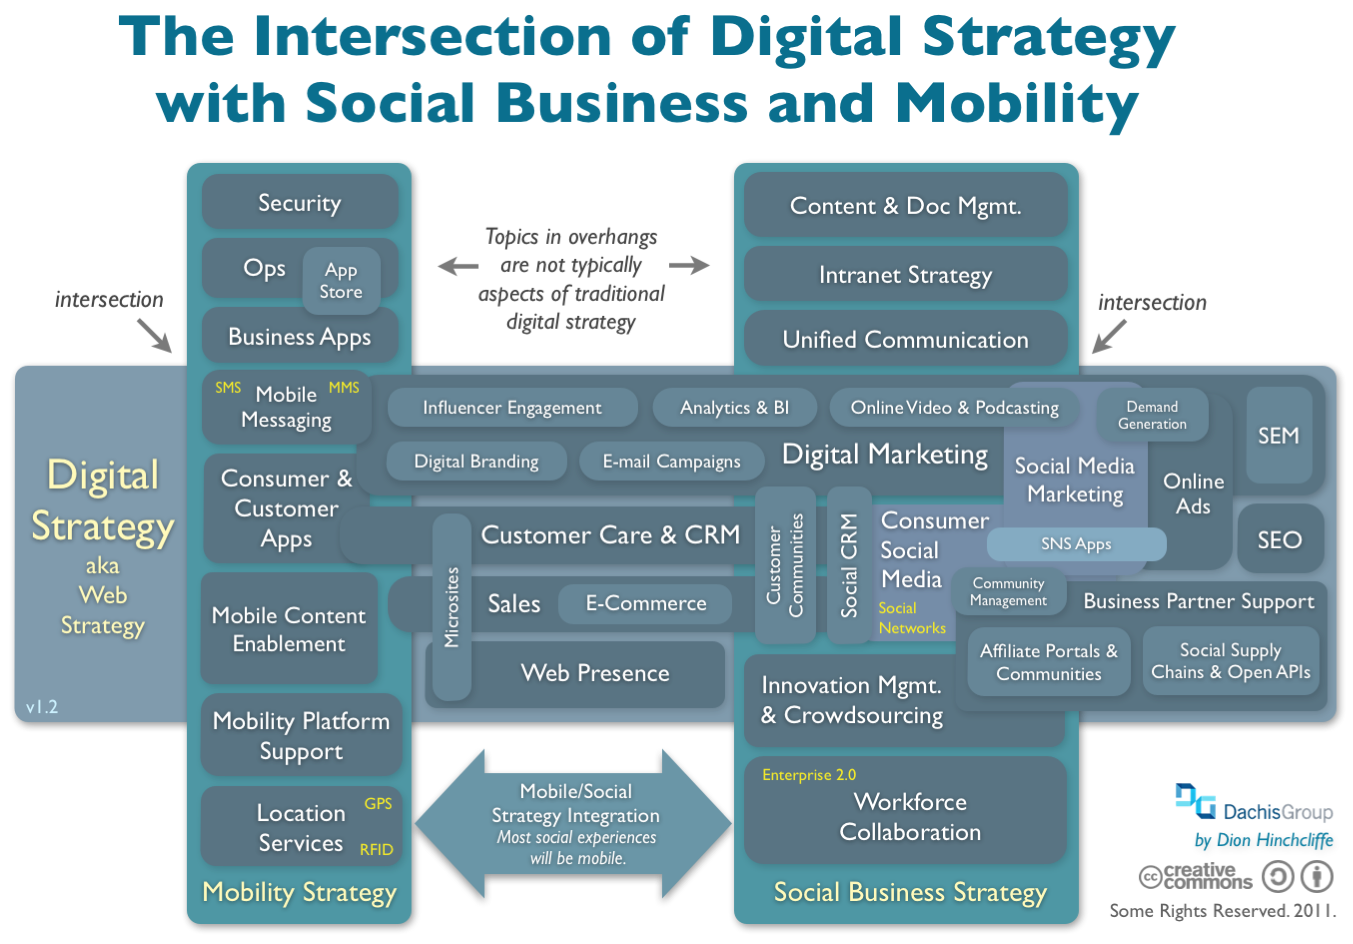 Intersectionofdigitalstrategyandsocialbusinessandmobility